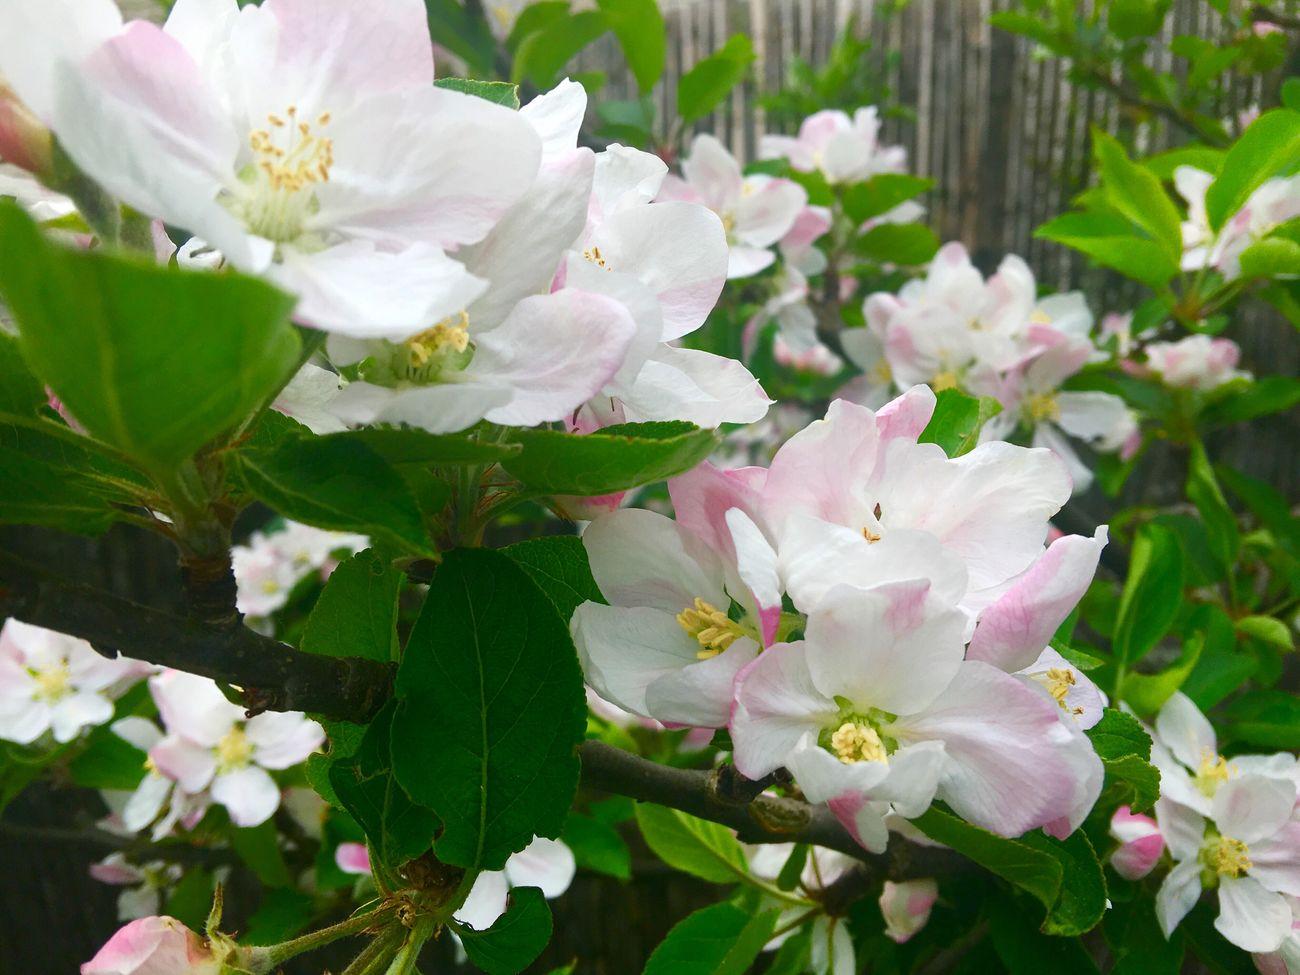 Apple Blossom My Garden @my Home Springtime Flower IPhone Photography